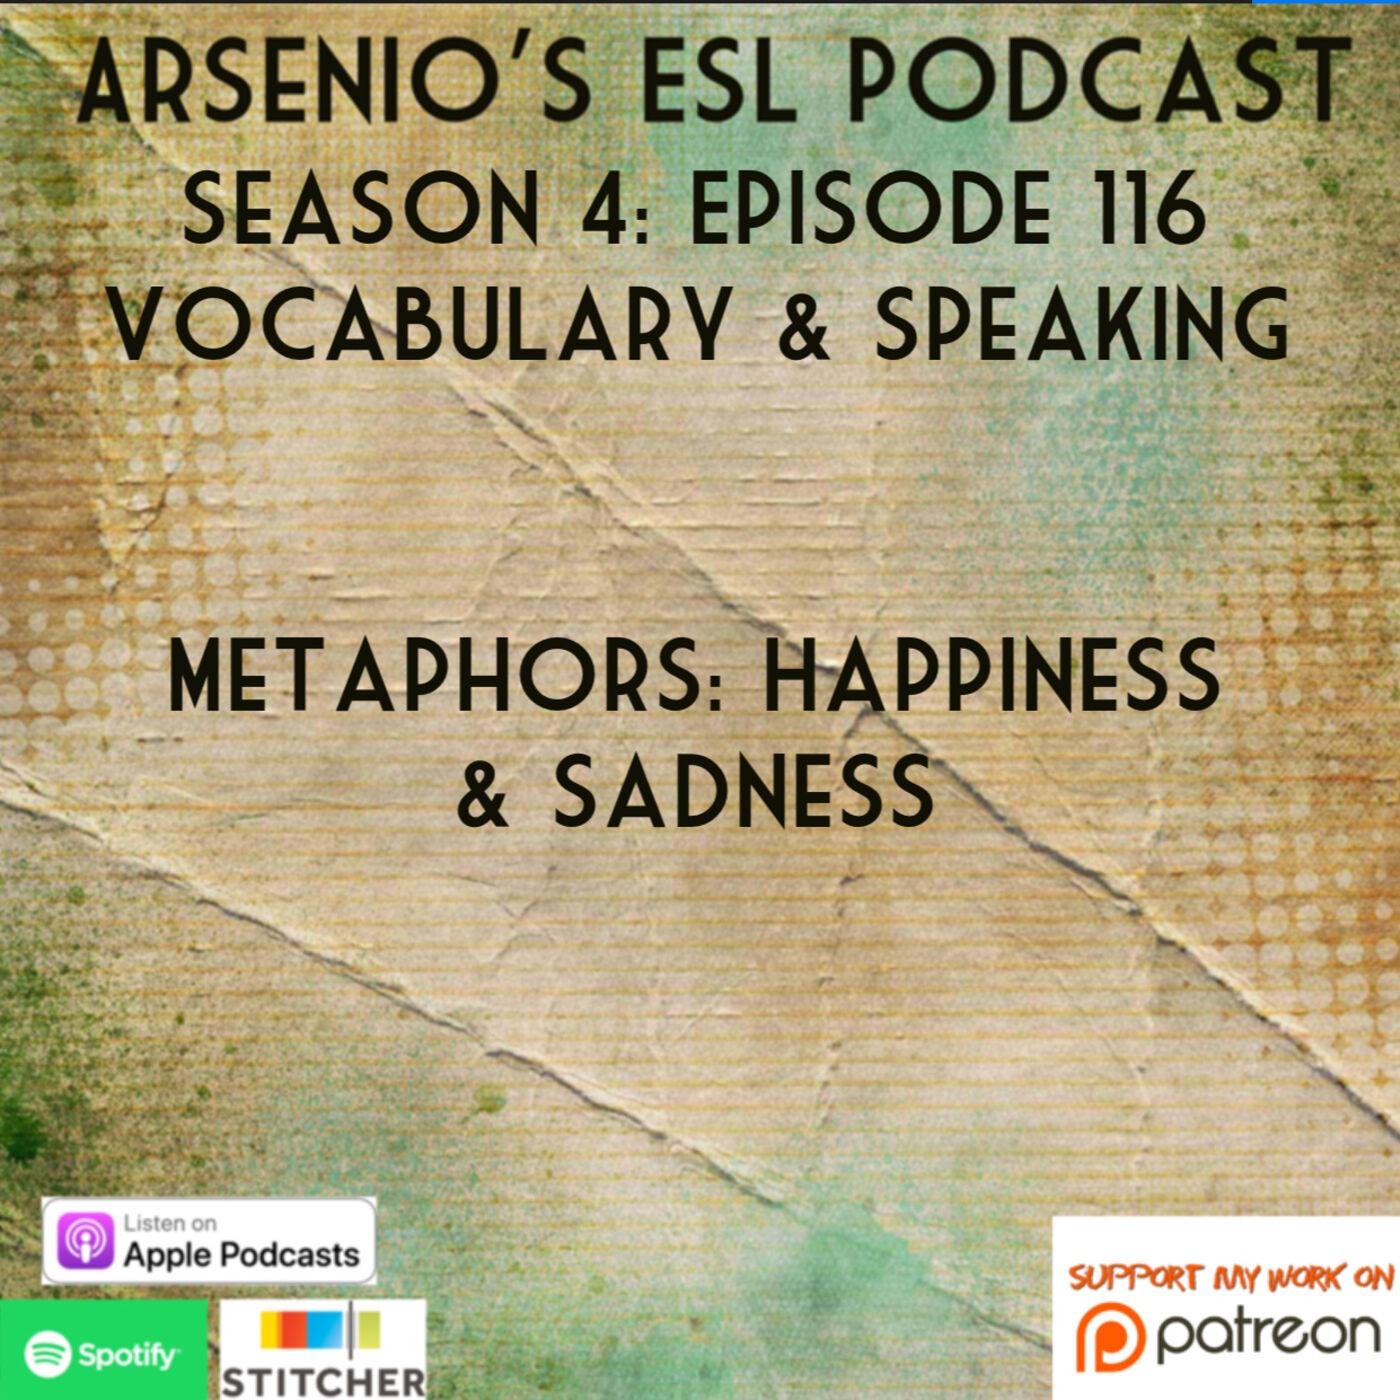 Arsenio's ESL Podcast: Season 4 - Episode 116 - Vocabulary + Speaking - Metaphors - Happiness and Sadness